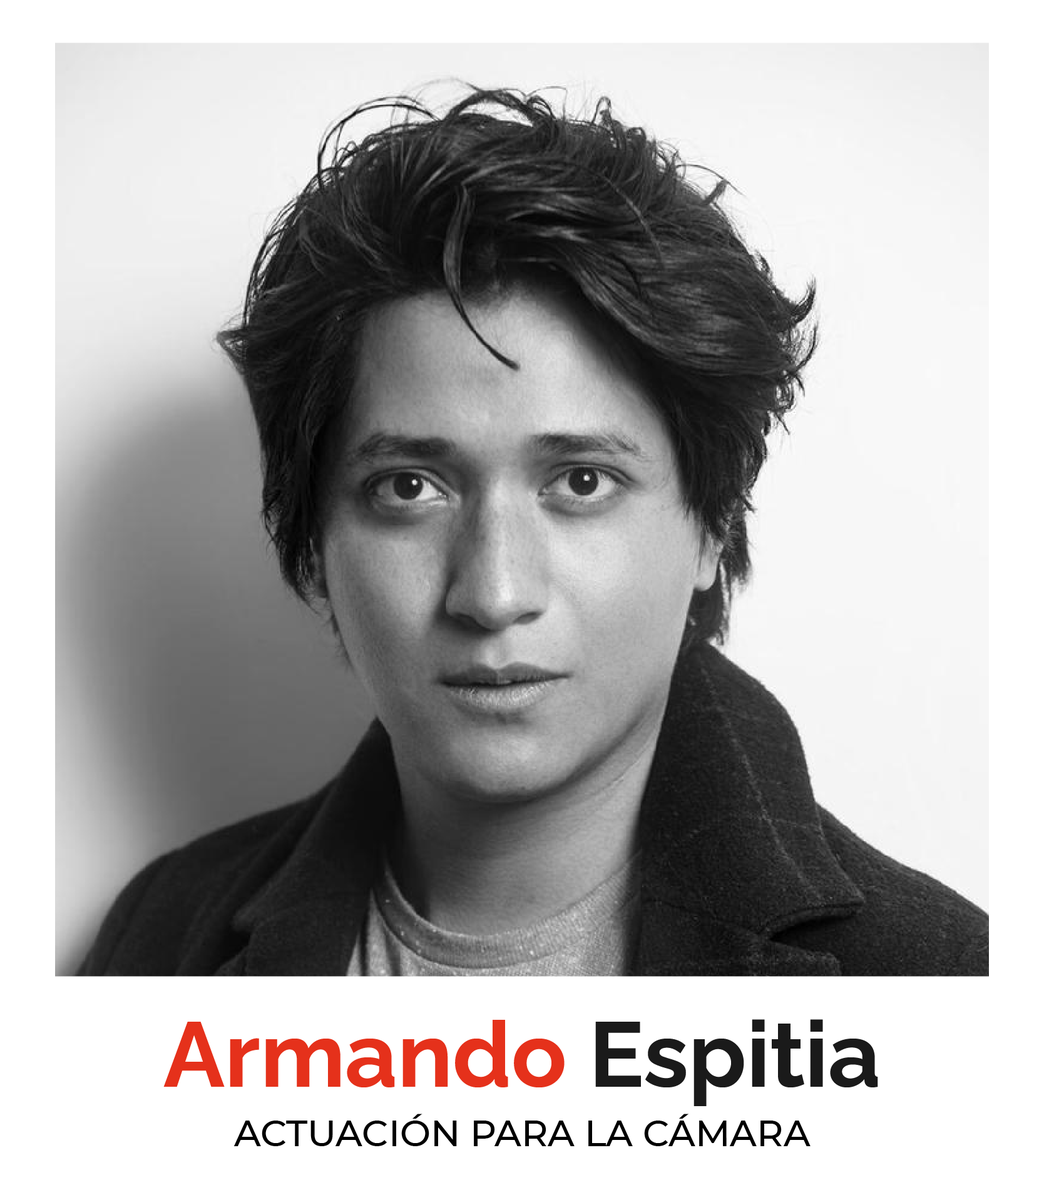 Armando Espitia